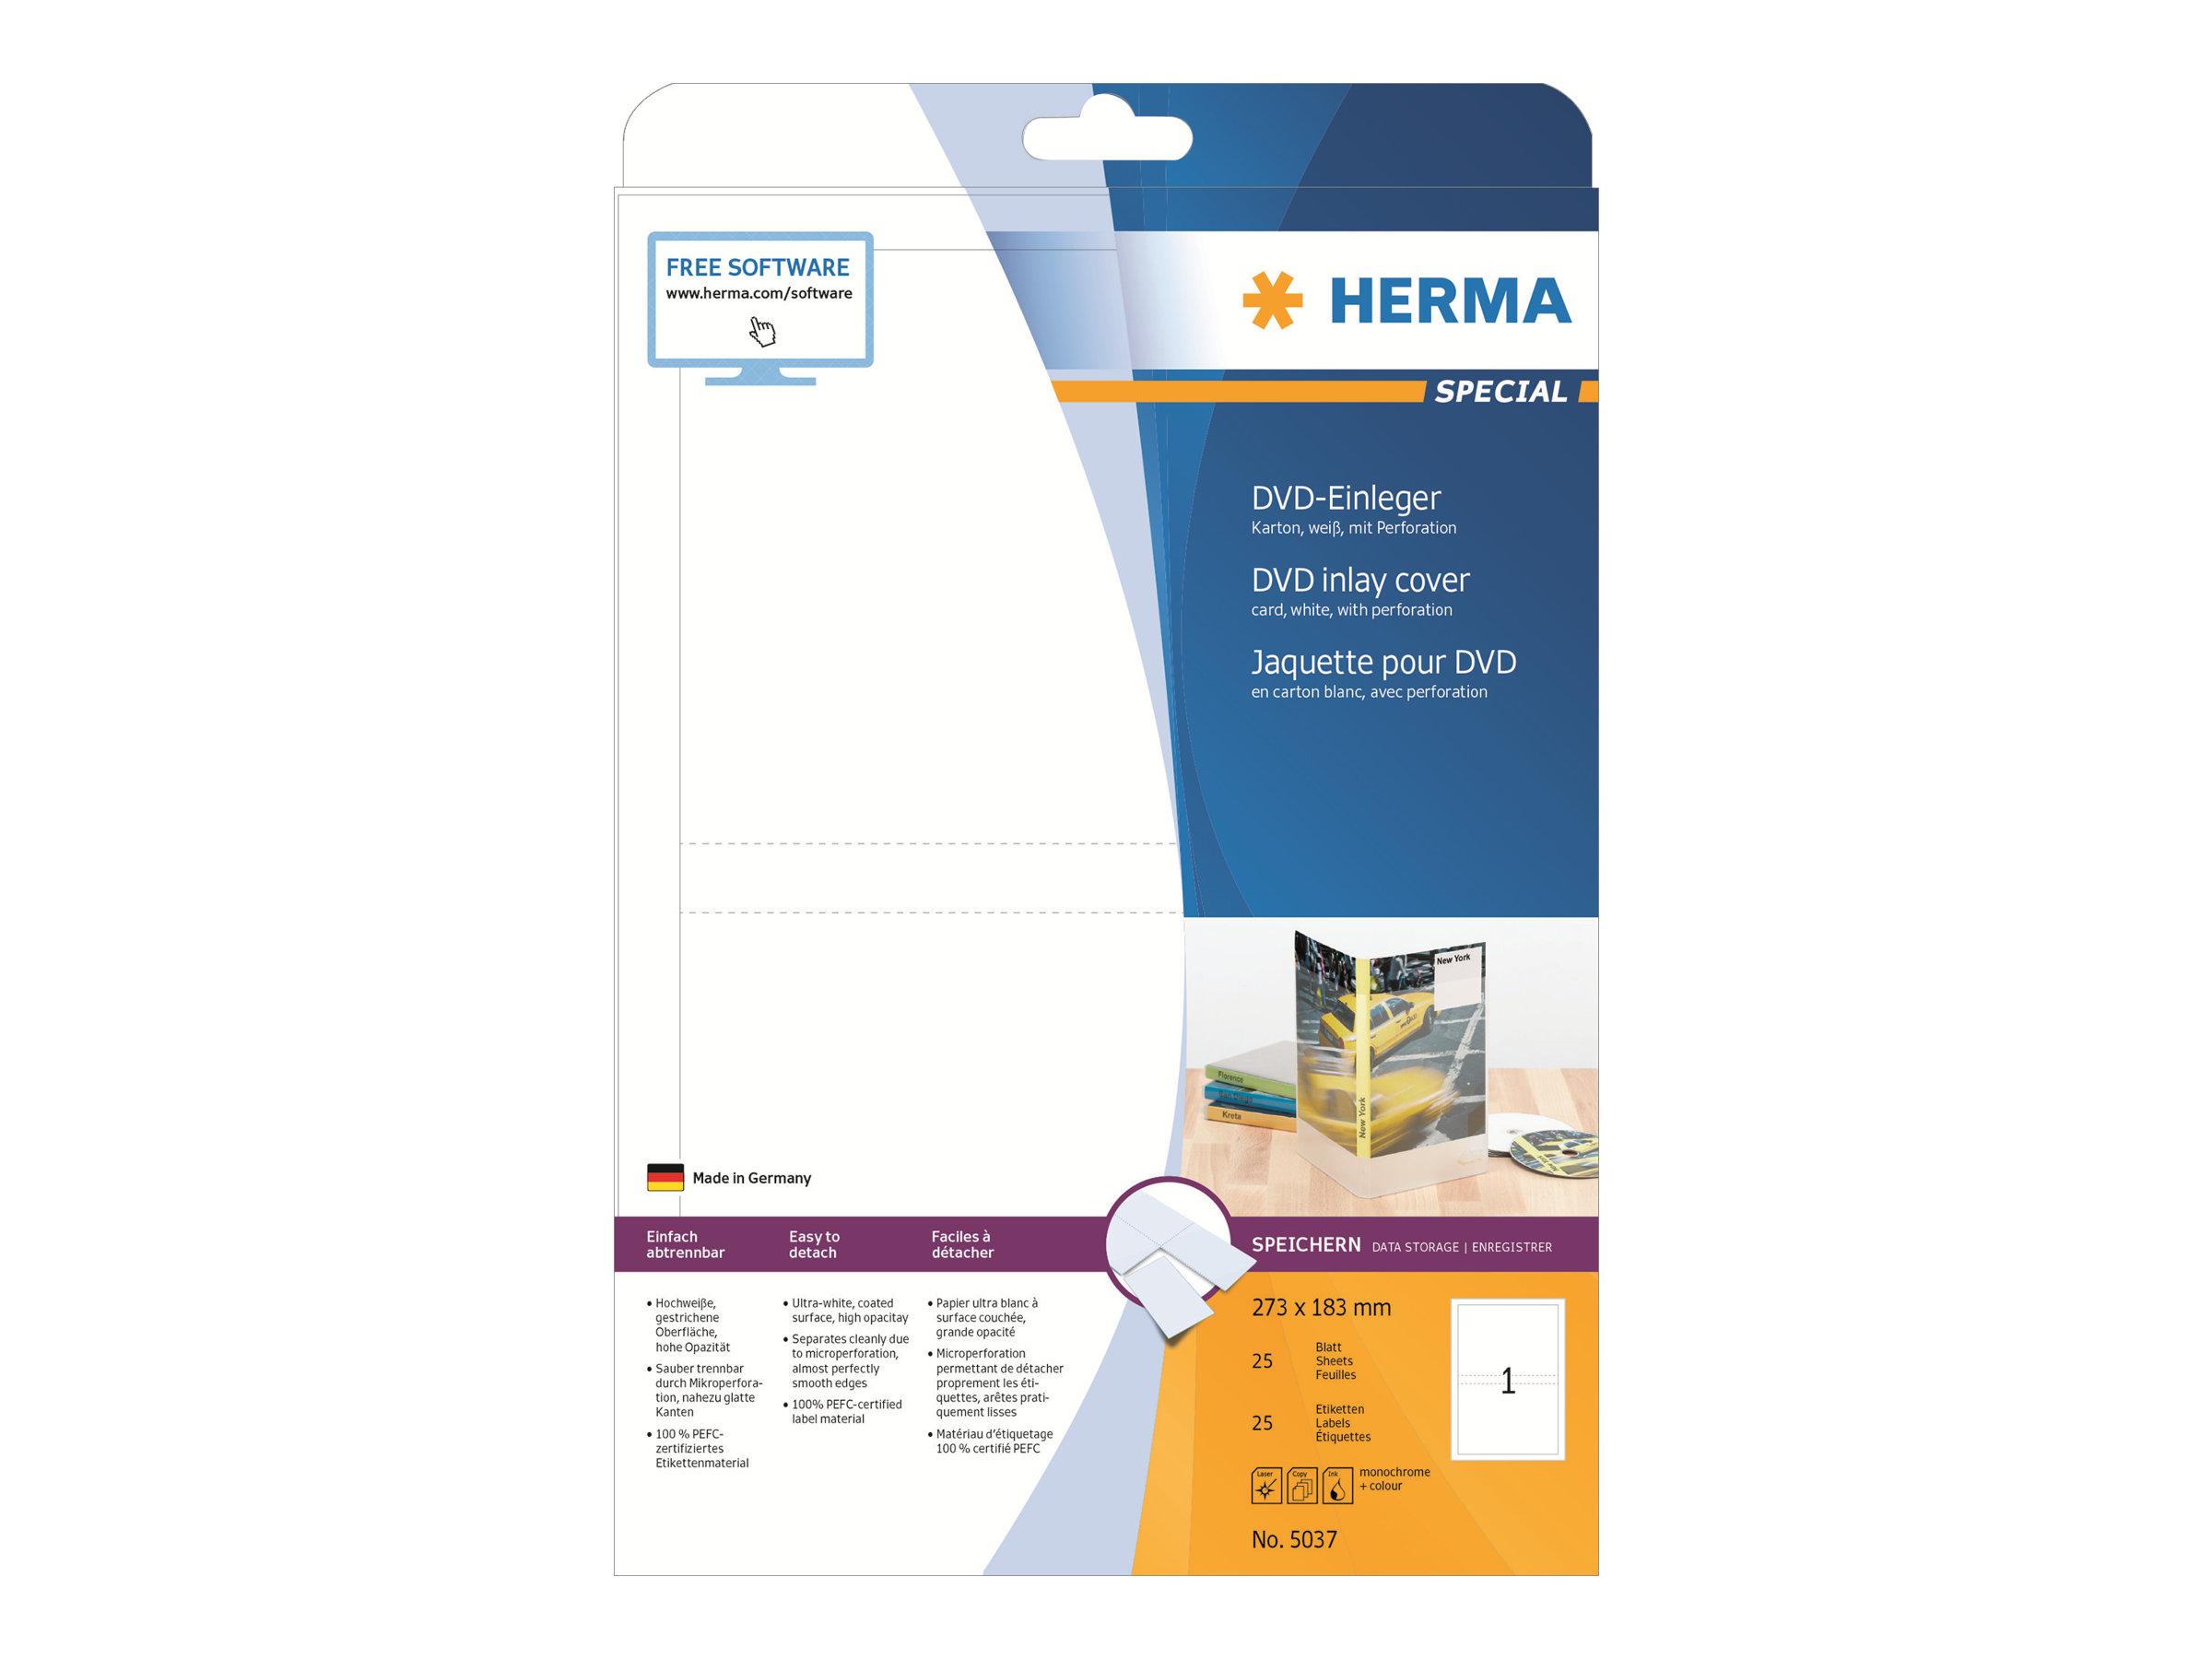 HERMA Special - Weiß - 183 x 273 mm 25 Stck.